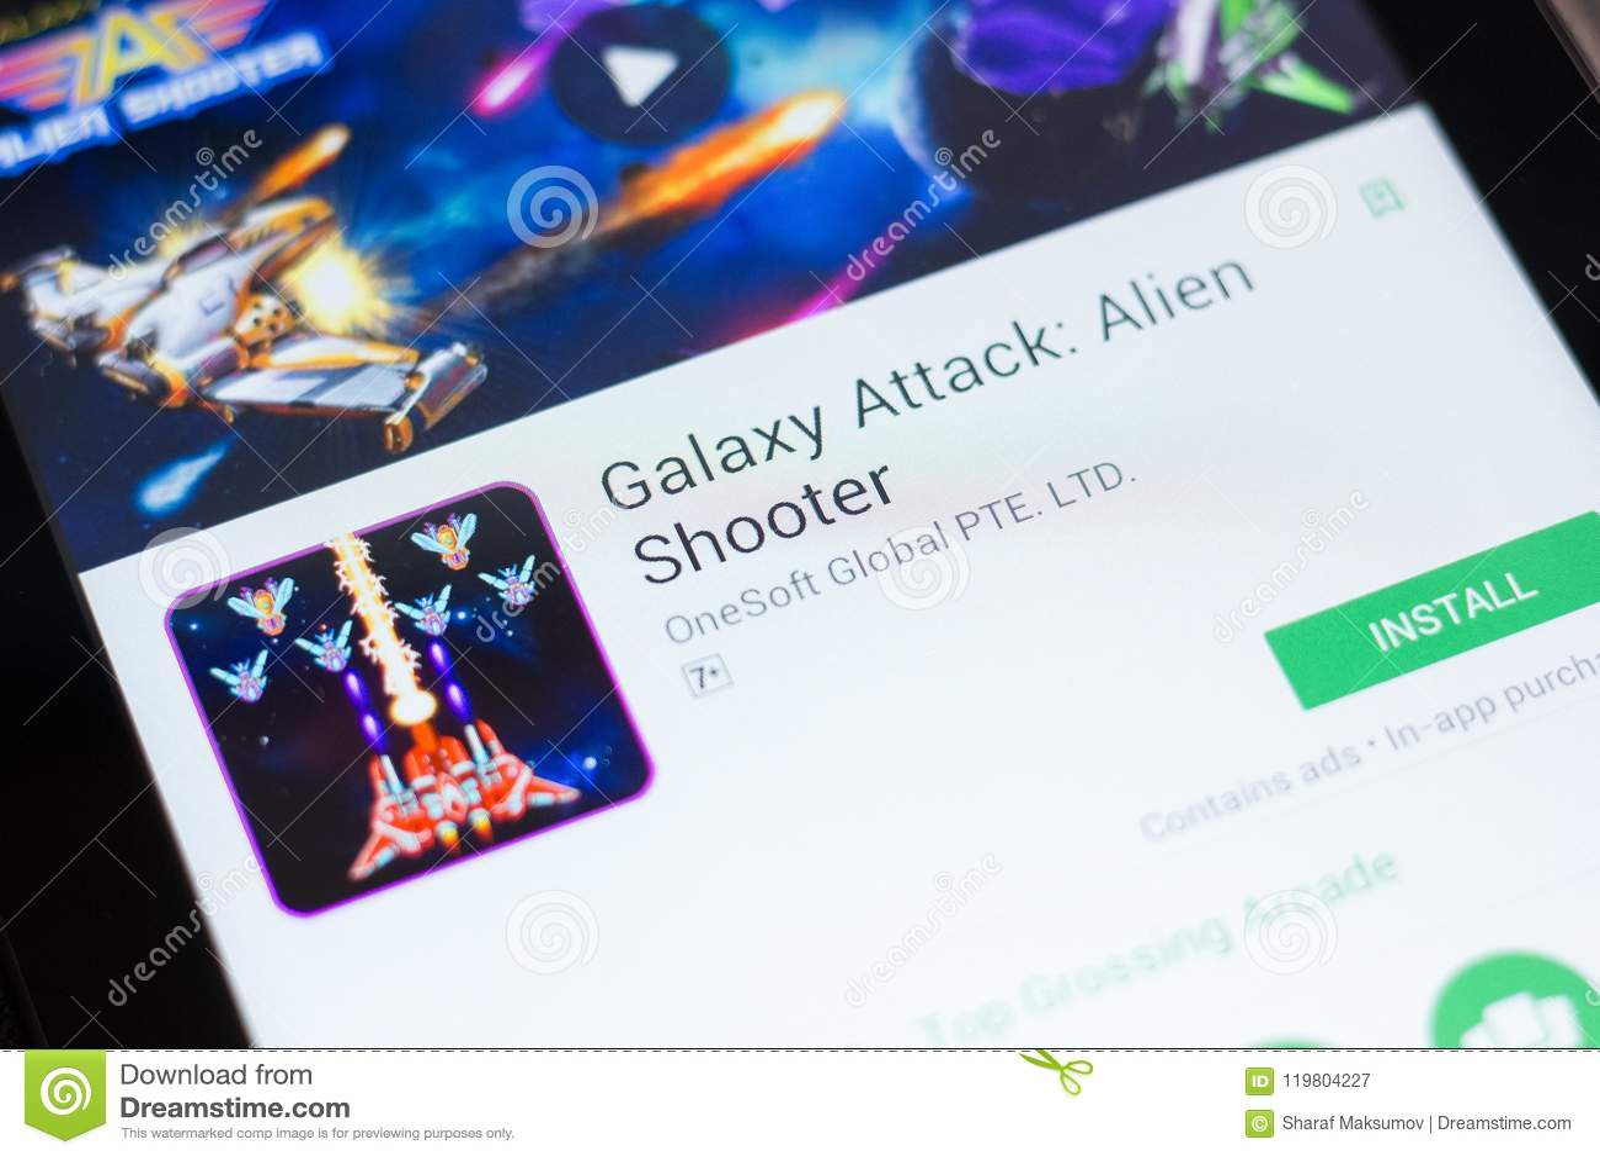 Ryazan, Russia - June 24, 2018: Galaxy Attack Alien Shooter Game